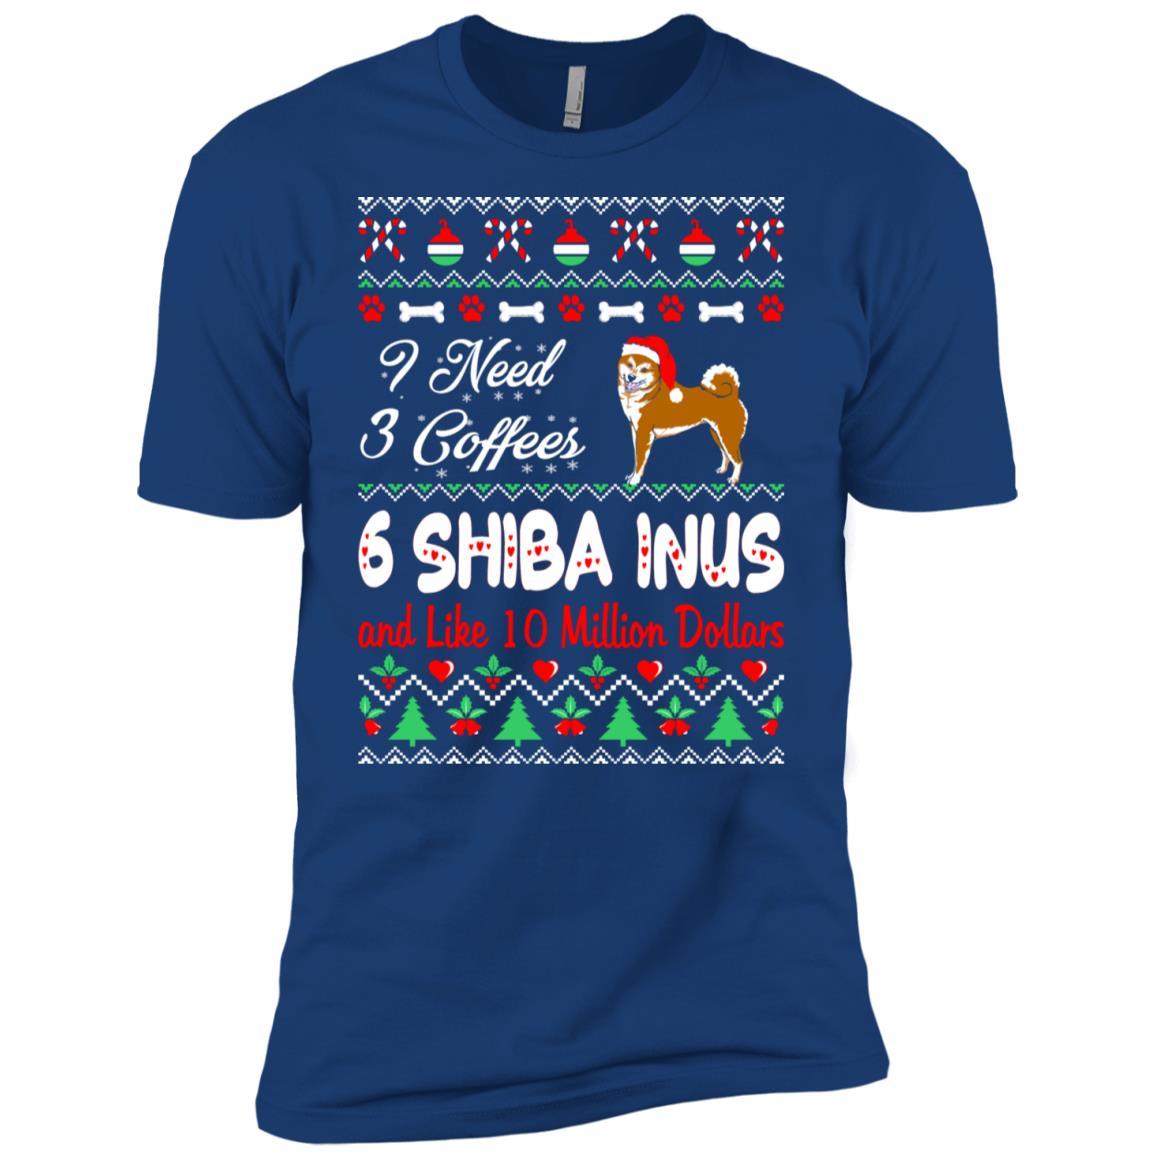 Need 3 Coffees 6 Shiba Inus Christmas Ugly Sweater Men Short Sleeve T-Shirt